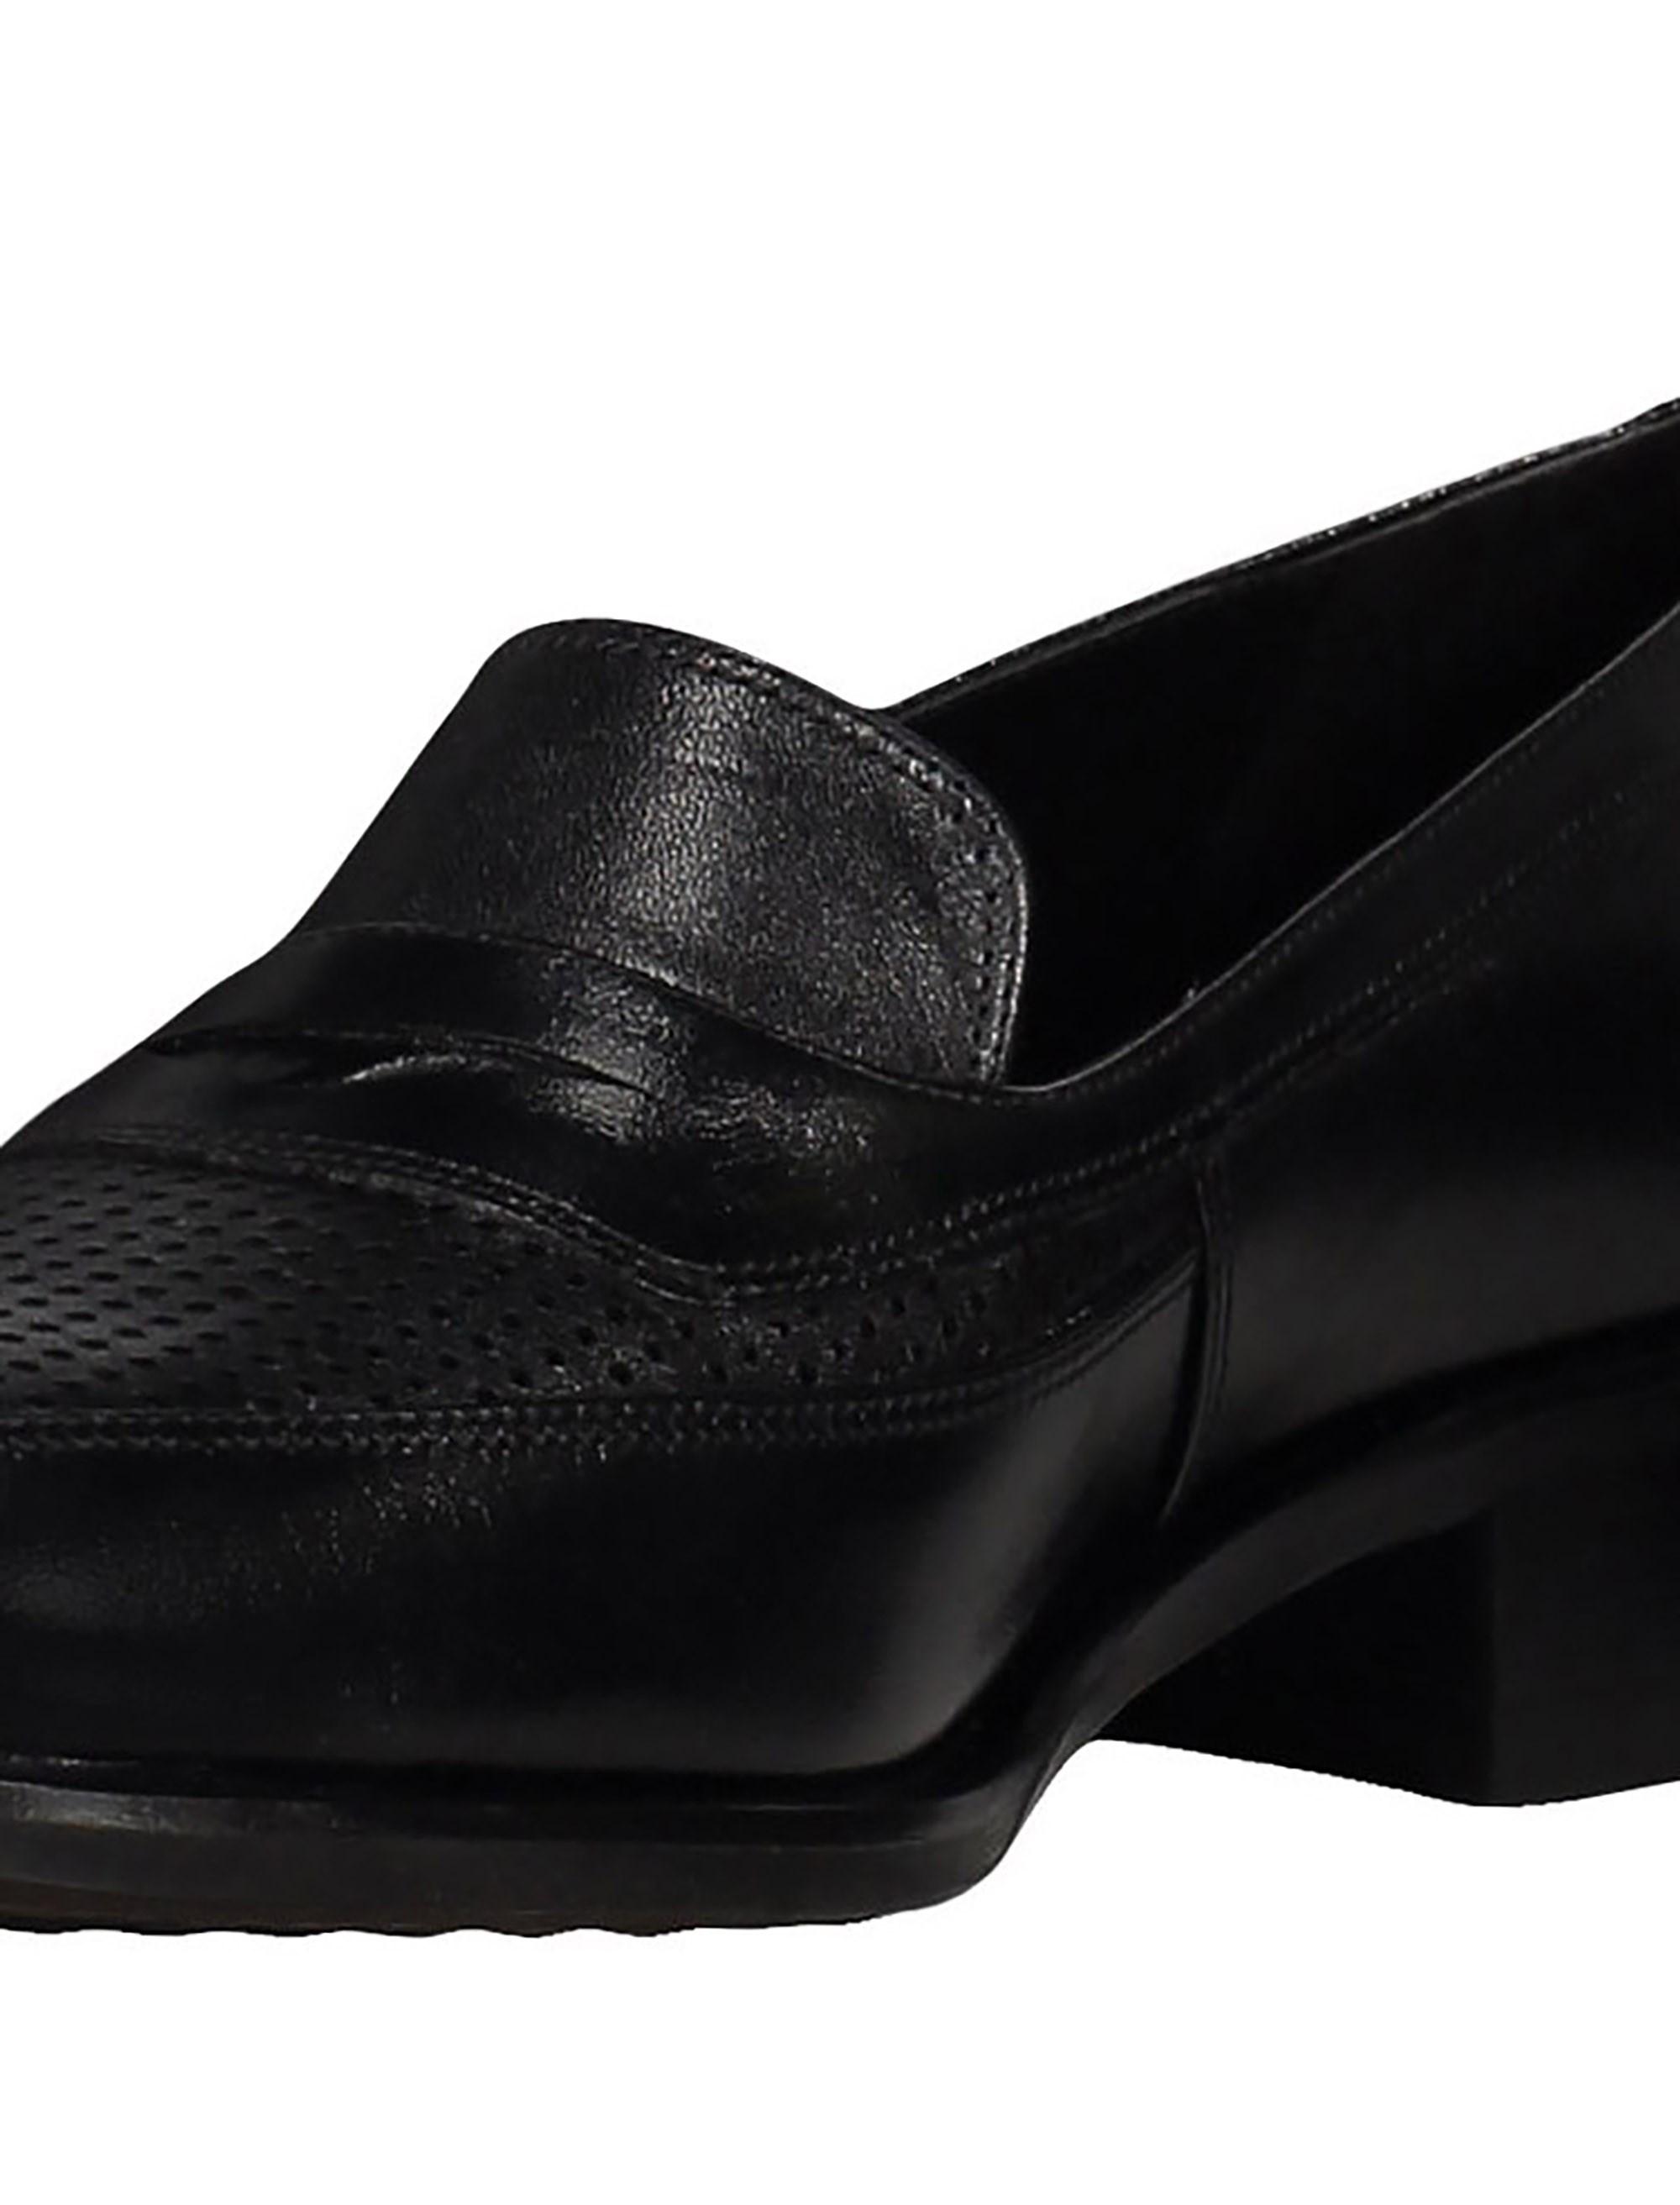 کفش چرم تخت زنانه - شهر چرم - مشکي - 6